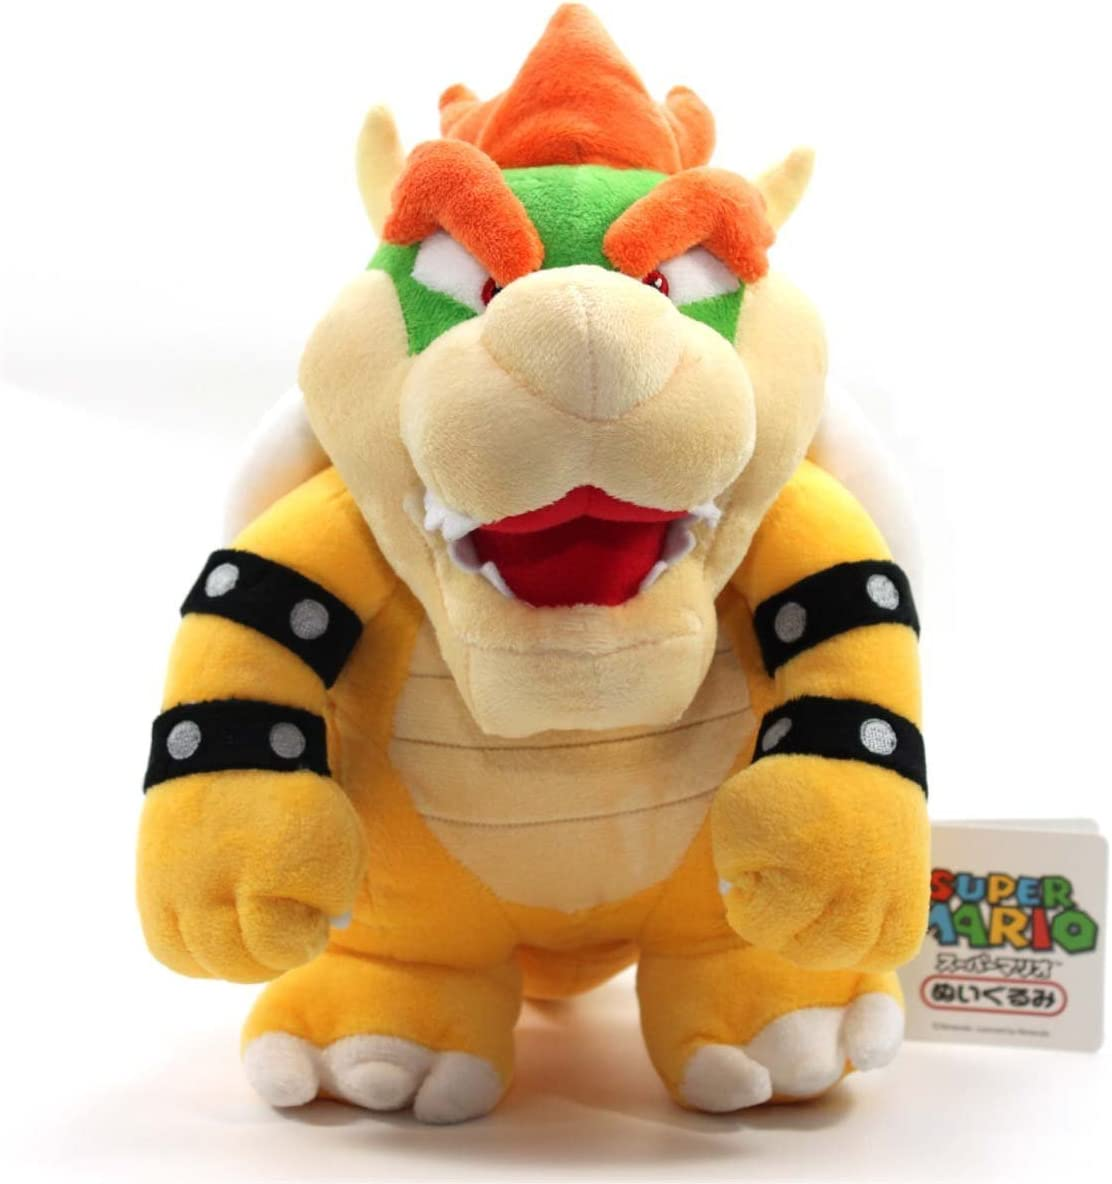 "B00OXR2INI TinTek 10"" Super Mario Brothers Standing King Bowser Soft Stuffed Animal Plush Doll Figure Toy 10 Inches 616khVSA02L"